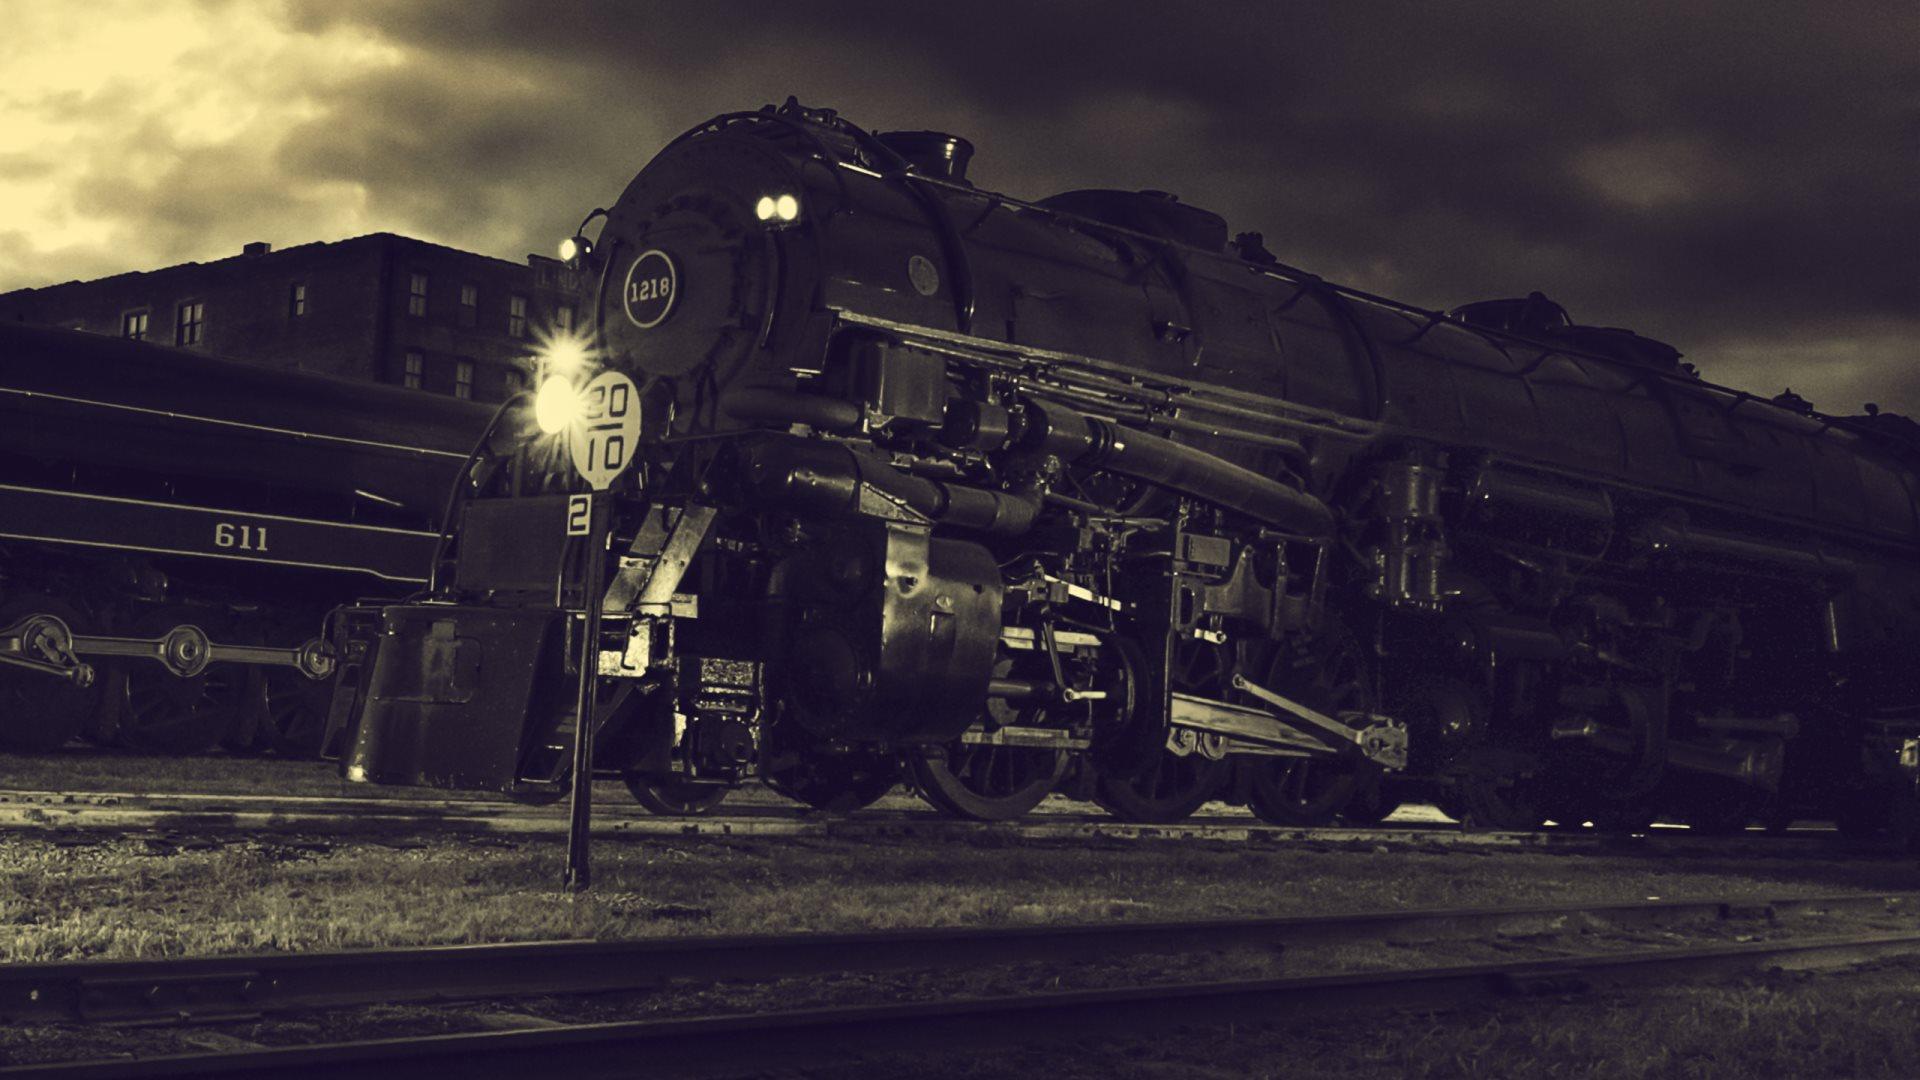 72+ Steam Locomotive Wallpaper on WallpaperSafari